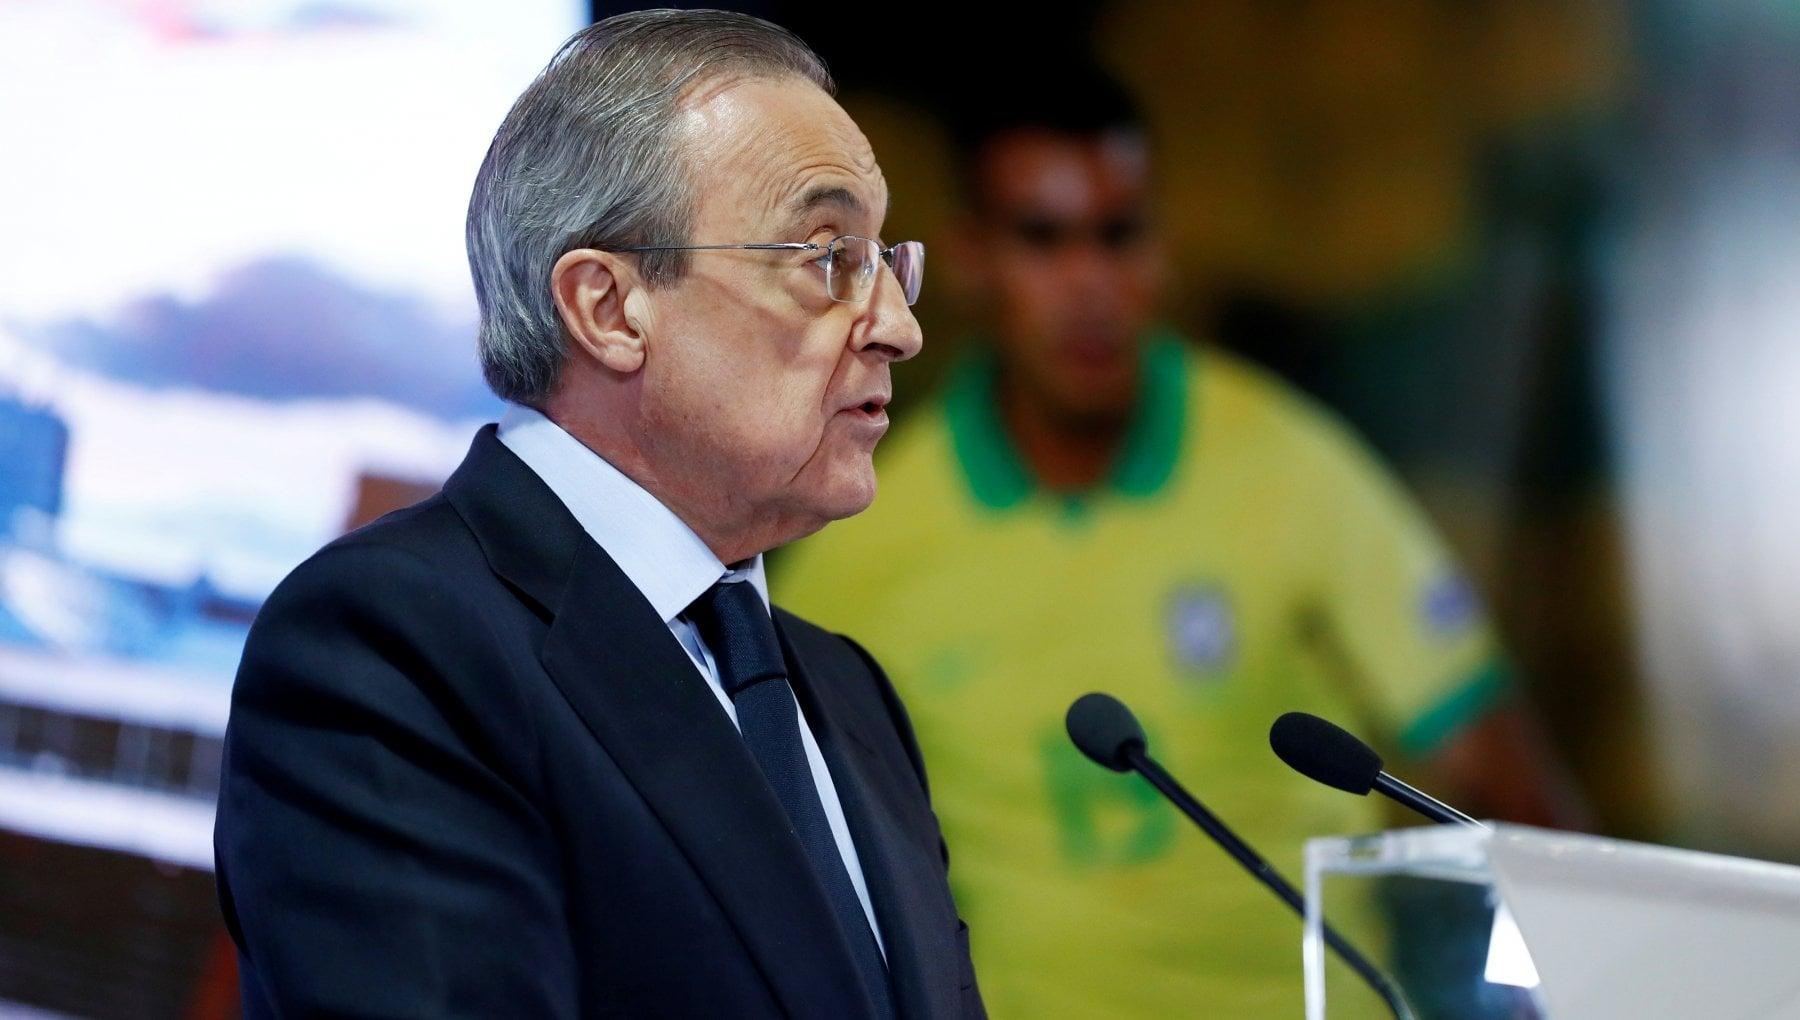 Real Madrid Florentino Perez lancia la Superlega europea Al calcio serve una nuova formula